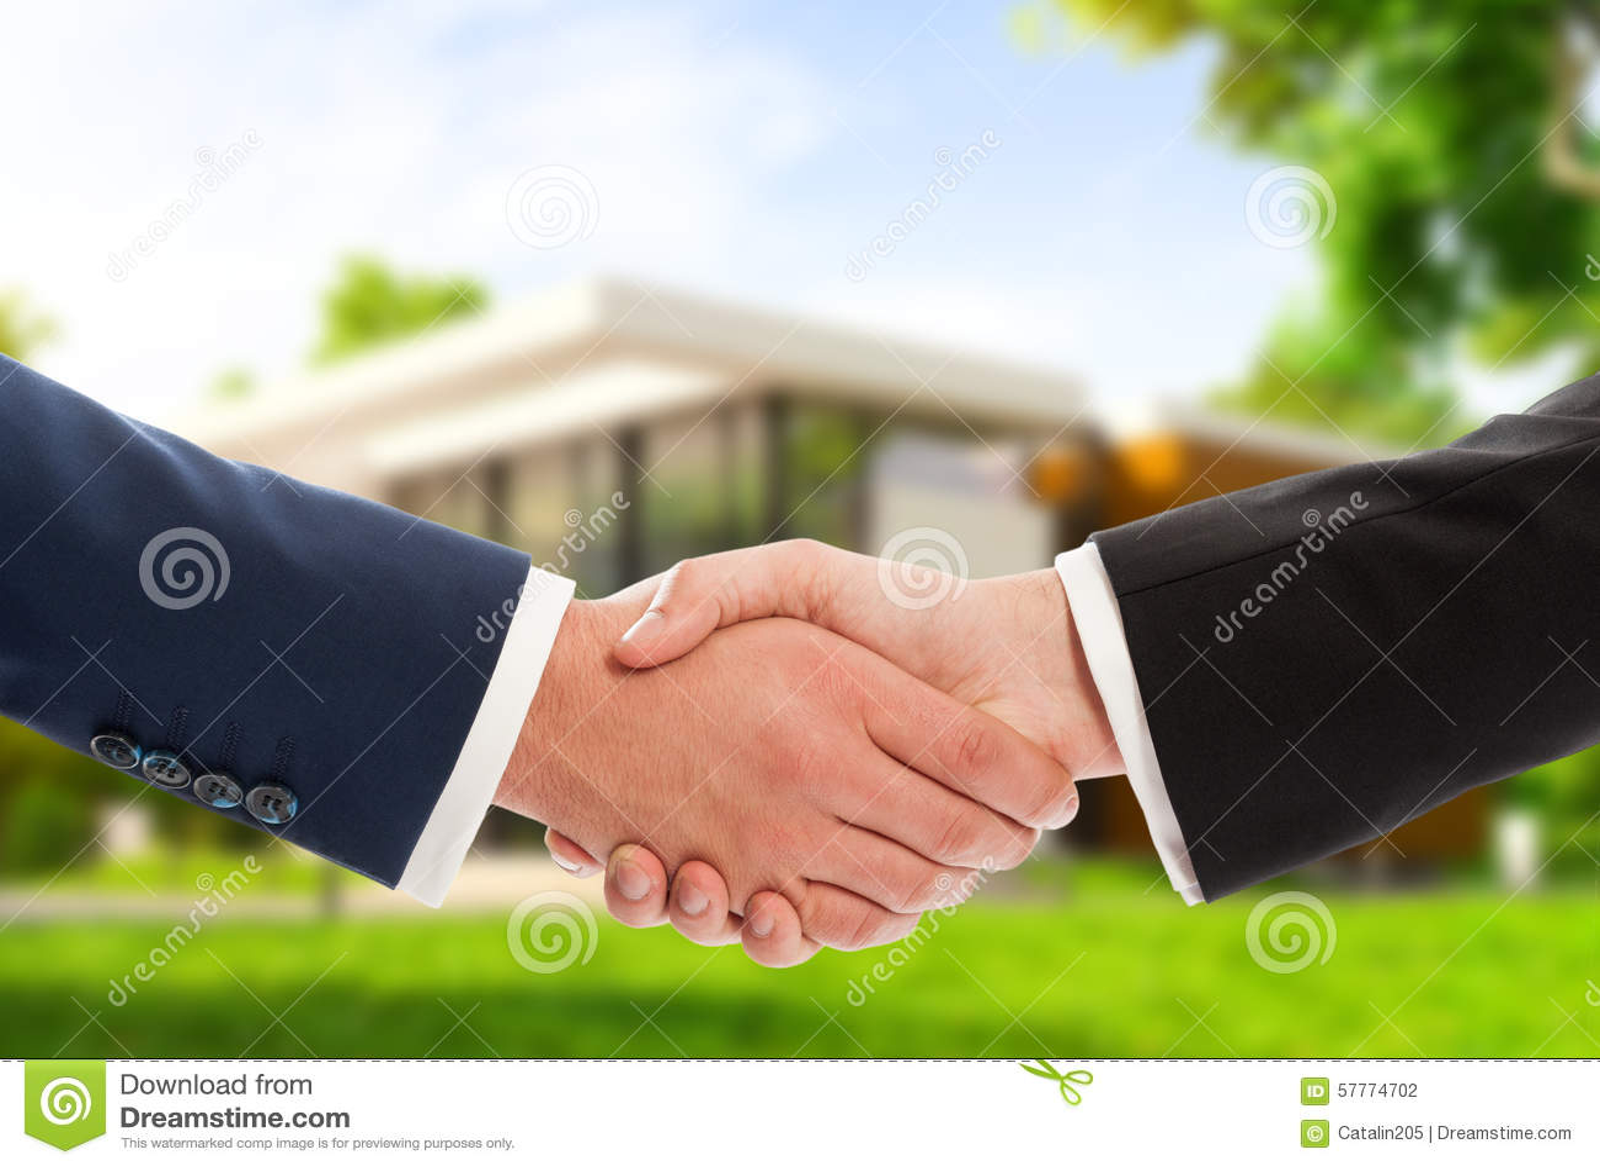 Handshake On House Outdoor Background Stock Photo Image